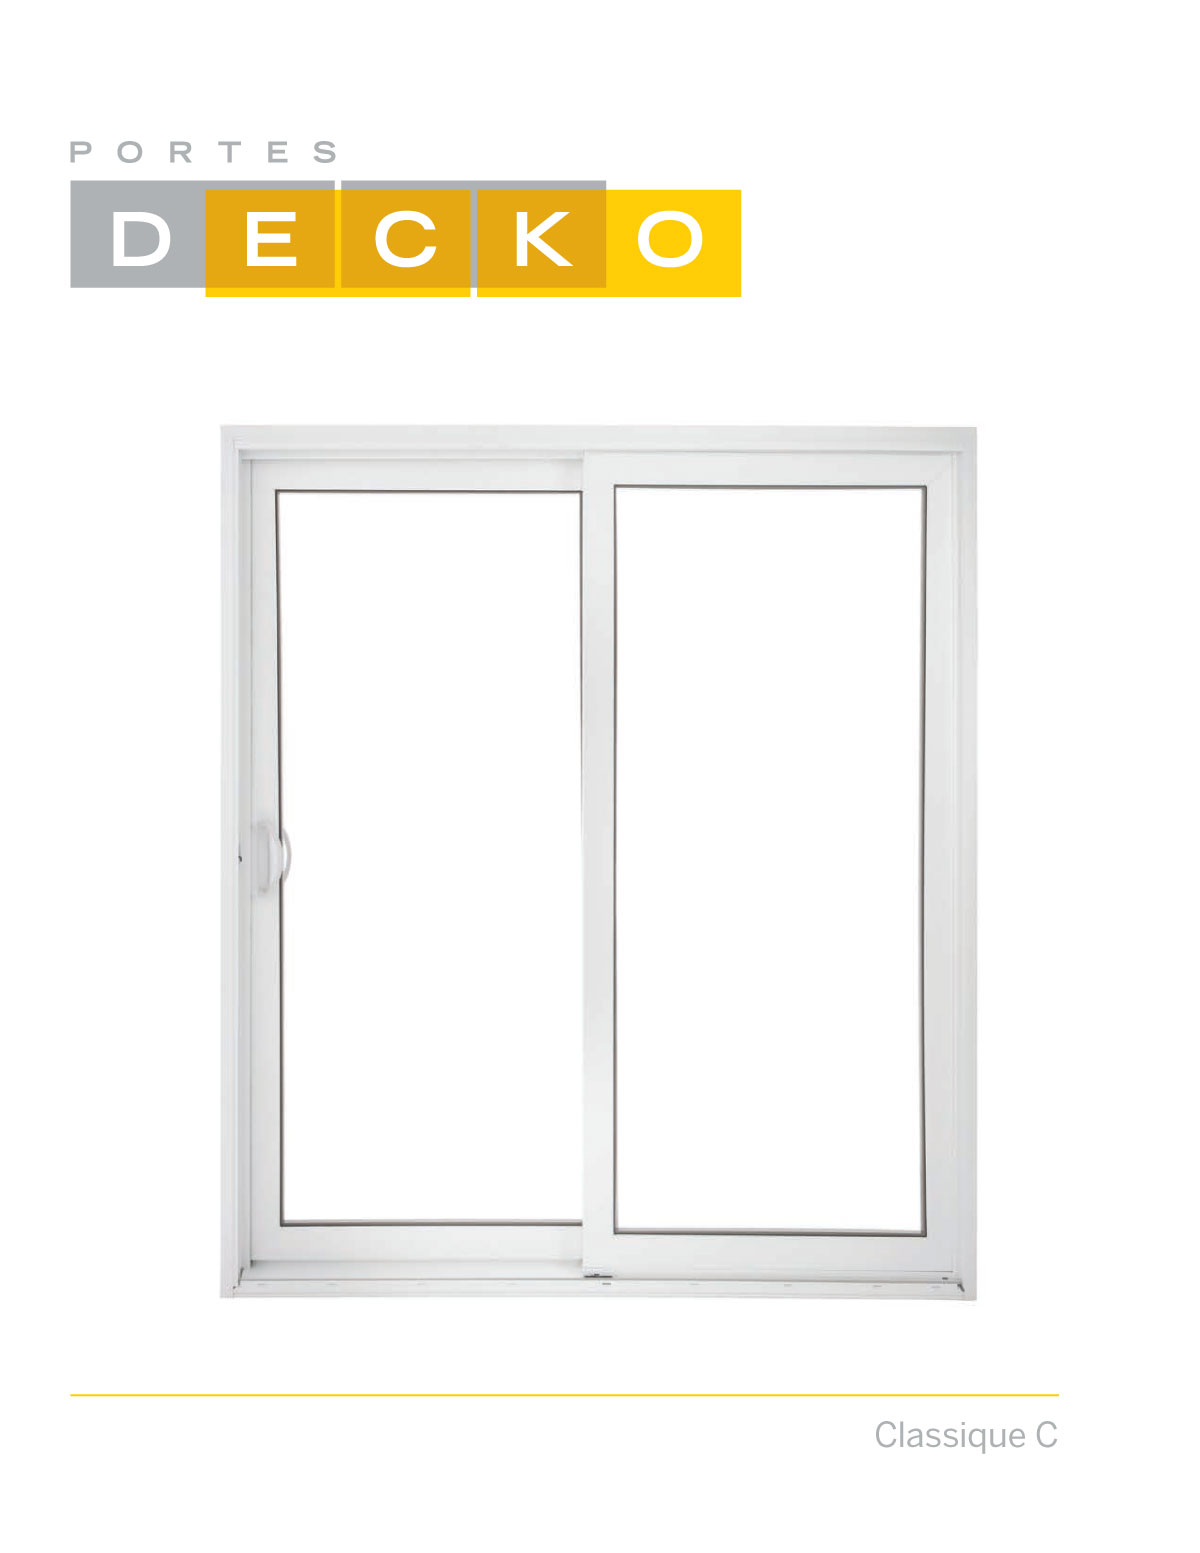 Porte patio Decko - Brochure Decko classique C